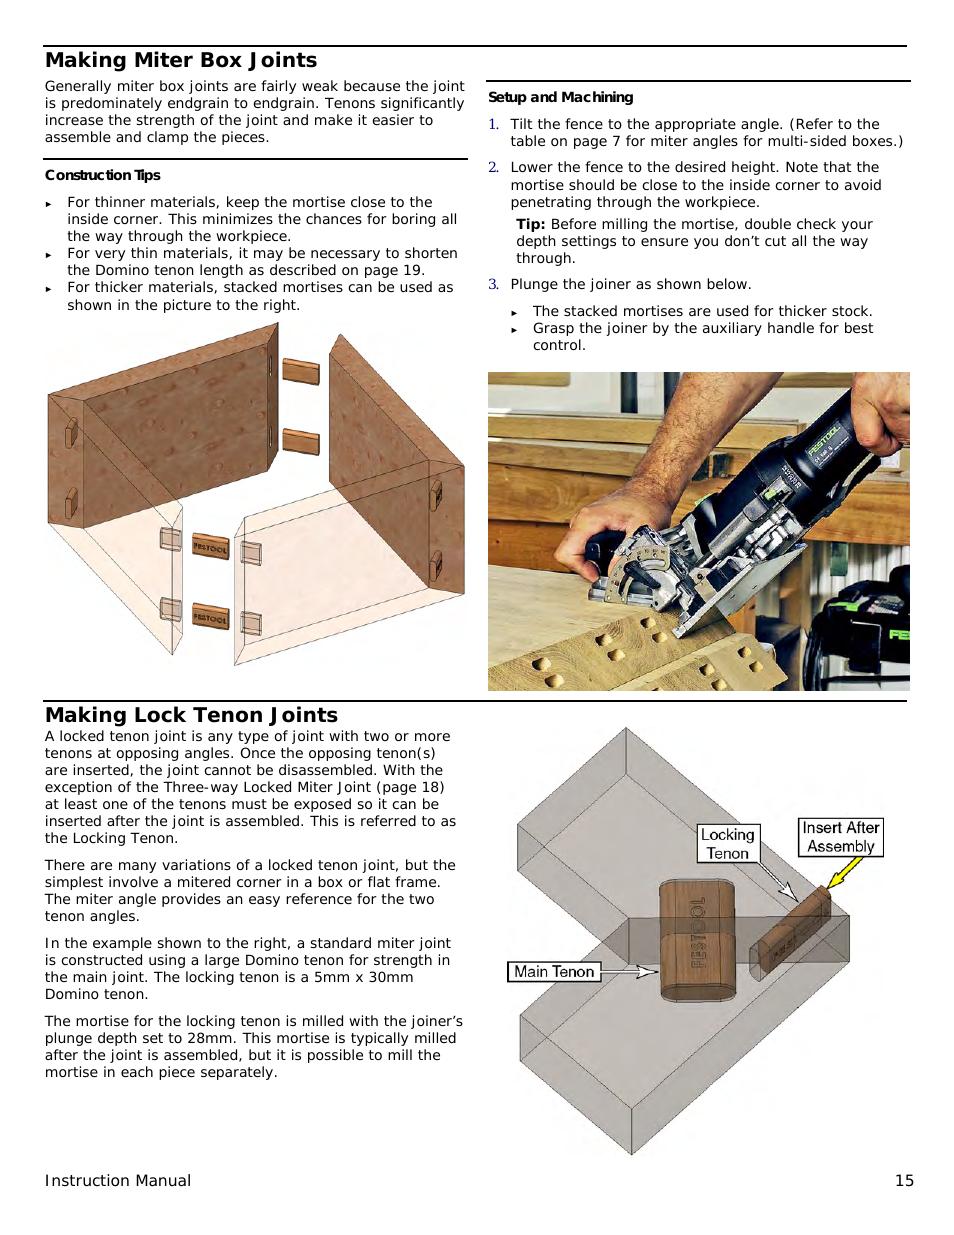 Festool Domino Df 500 Manual Page 15 Festool Woodworking Shop Woodworking